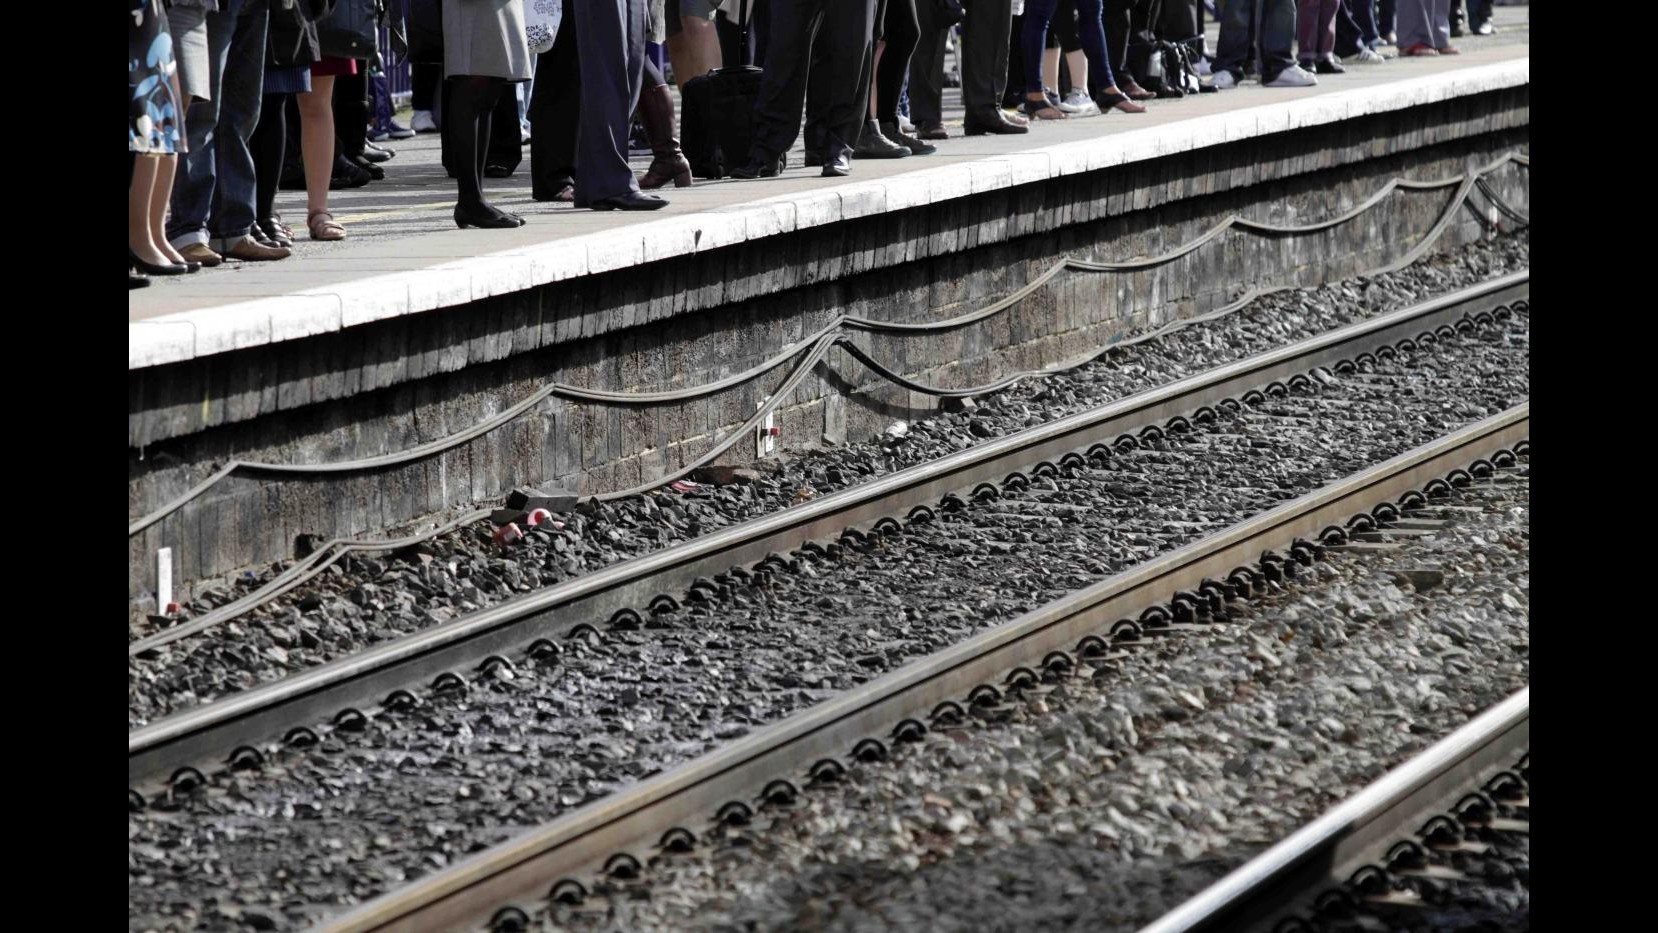 Spagna, deraglia treno a Santiago de Compostela: decine di morti